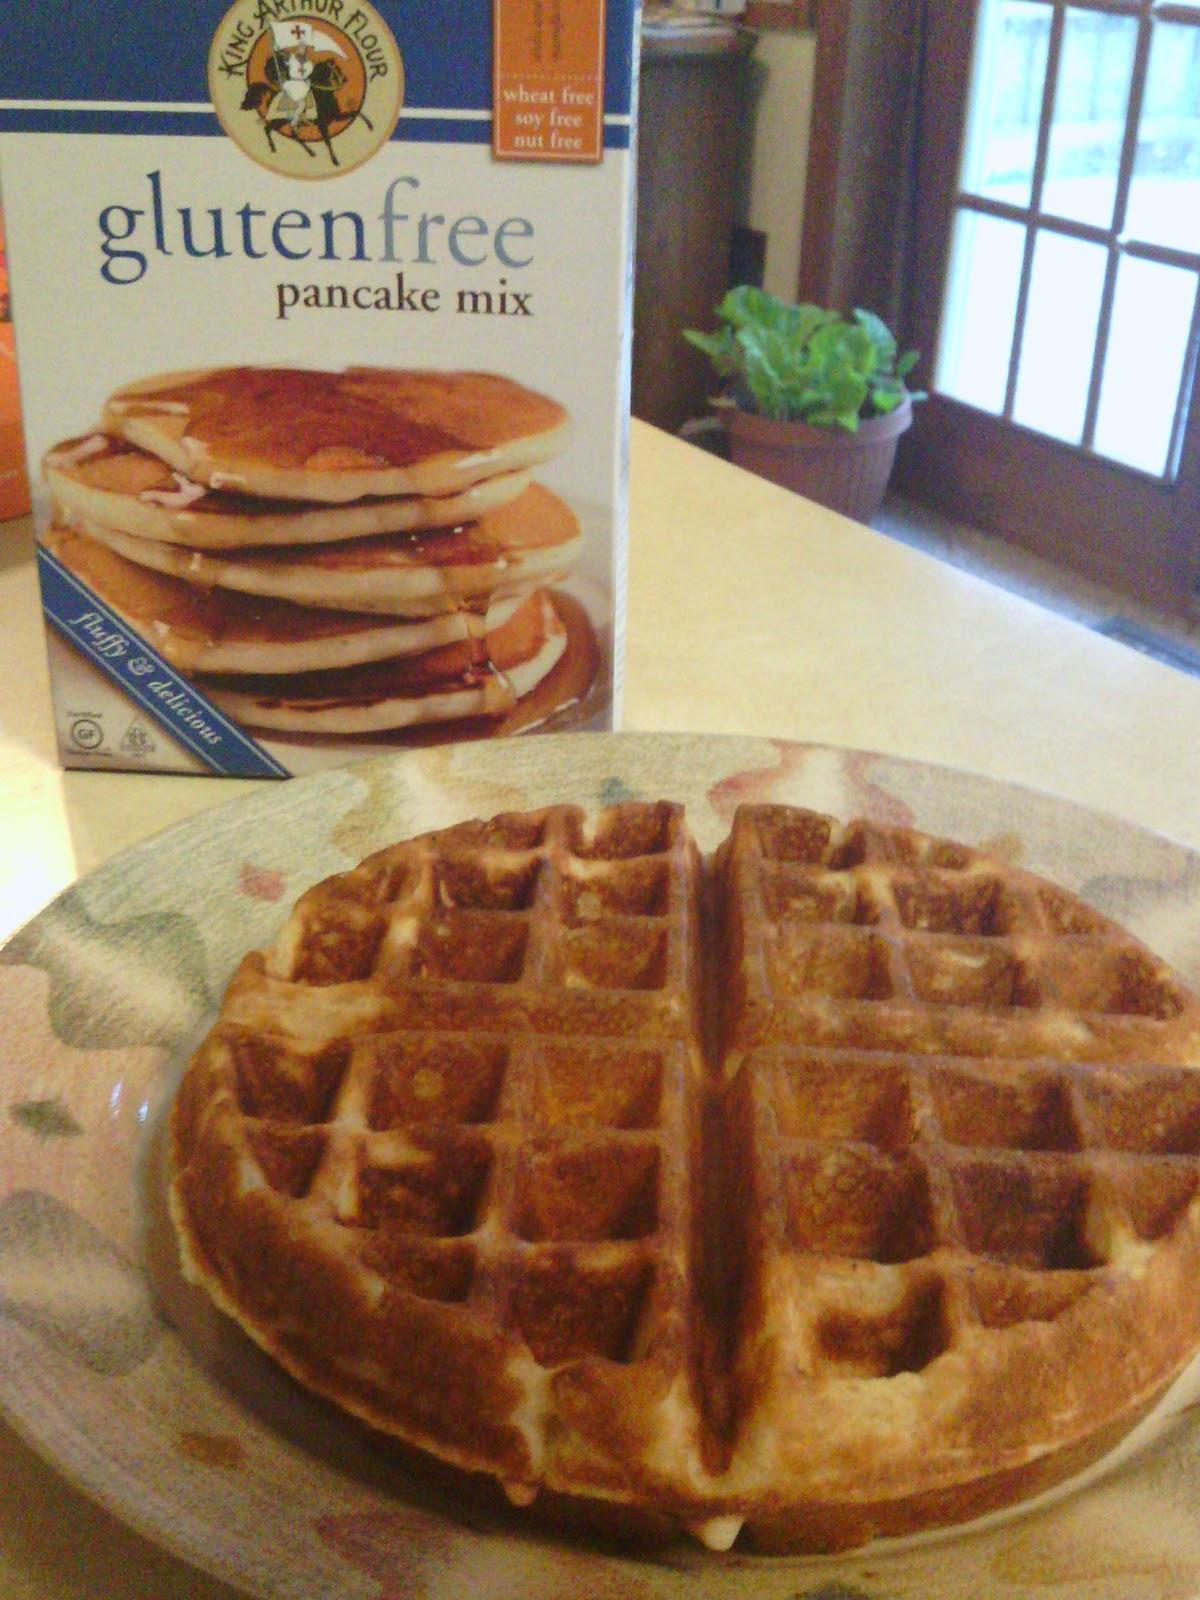 King arthur gluten free waffle recipe